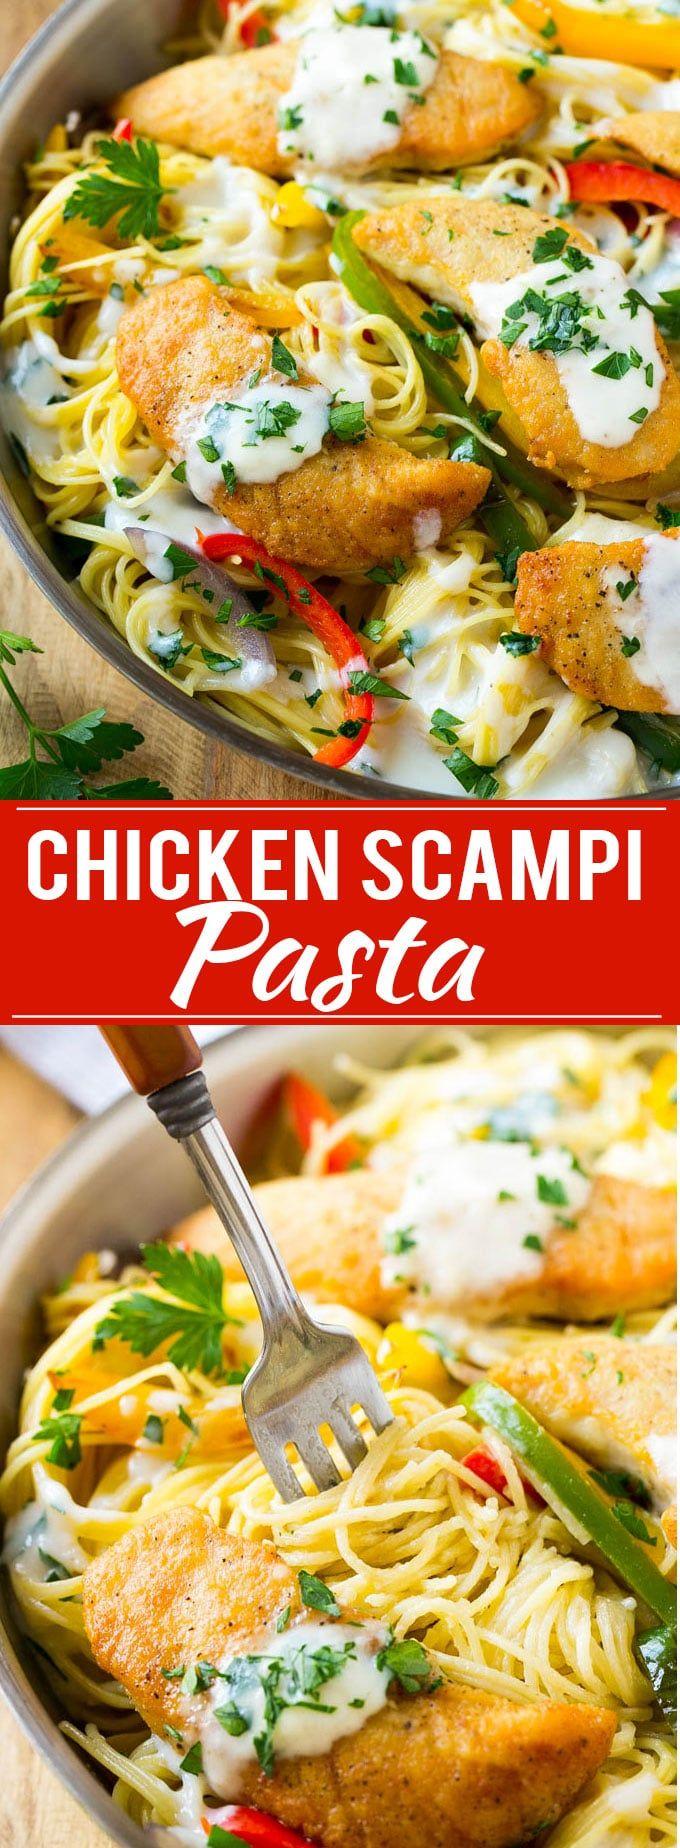 Chicken Scampi Recipe | Easy Chicken Pasta | Olive Garden Copycat | Creamy Chicken Pasta | Italian Food Recipe